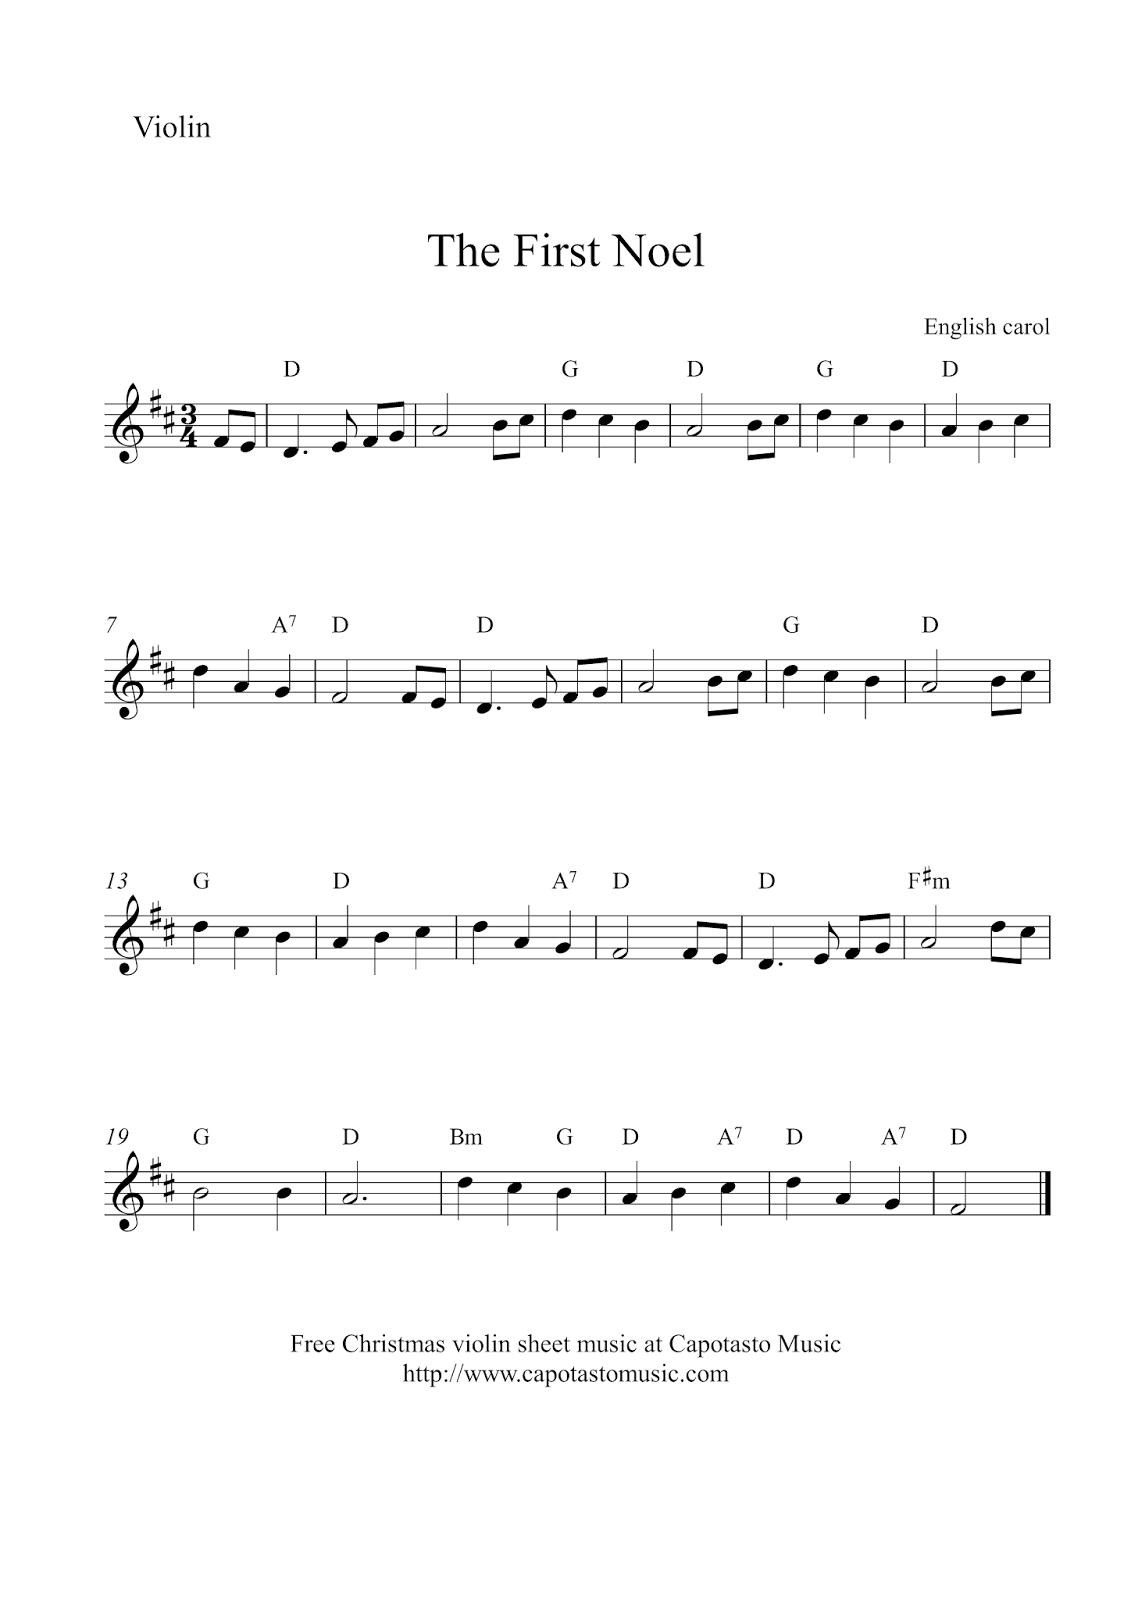 free christmas violin sheet music the first noel. Black Bedroom Furniture Sets. Home Design Ideas